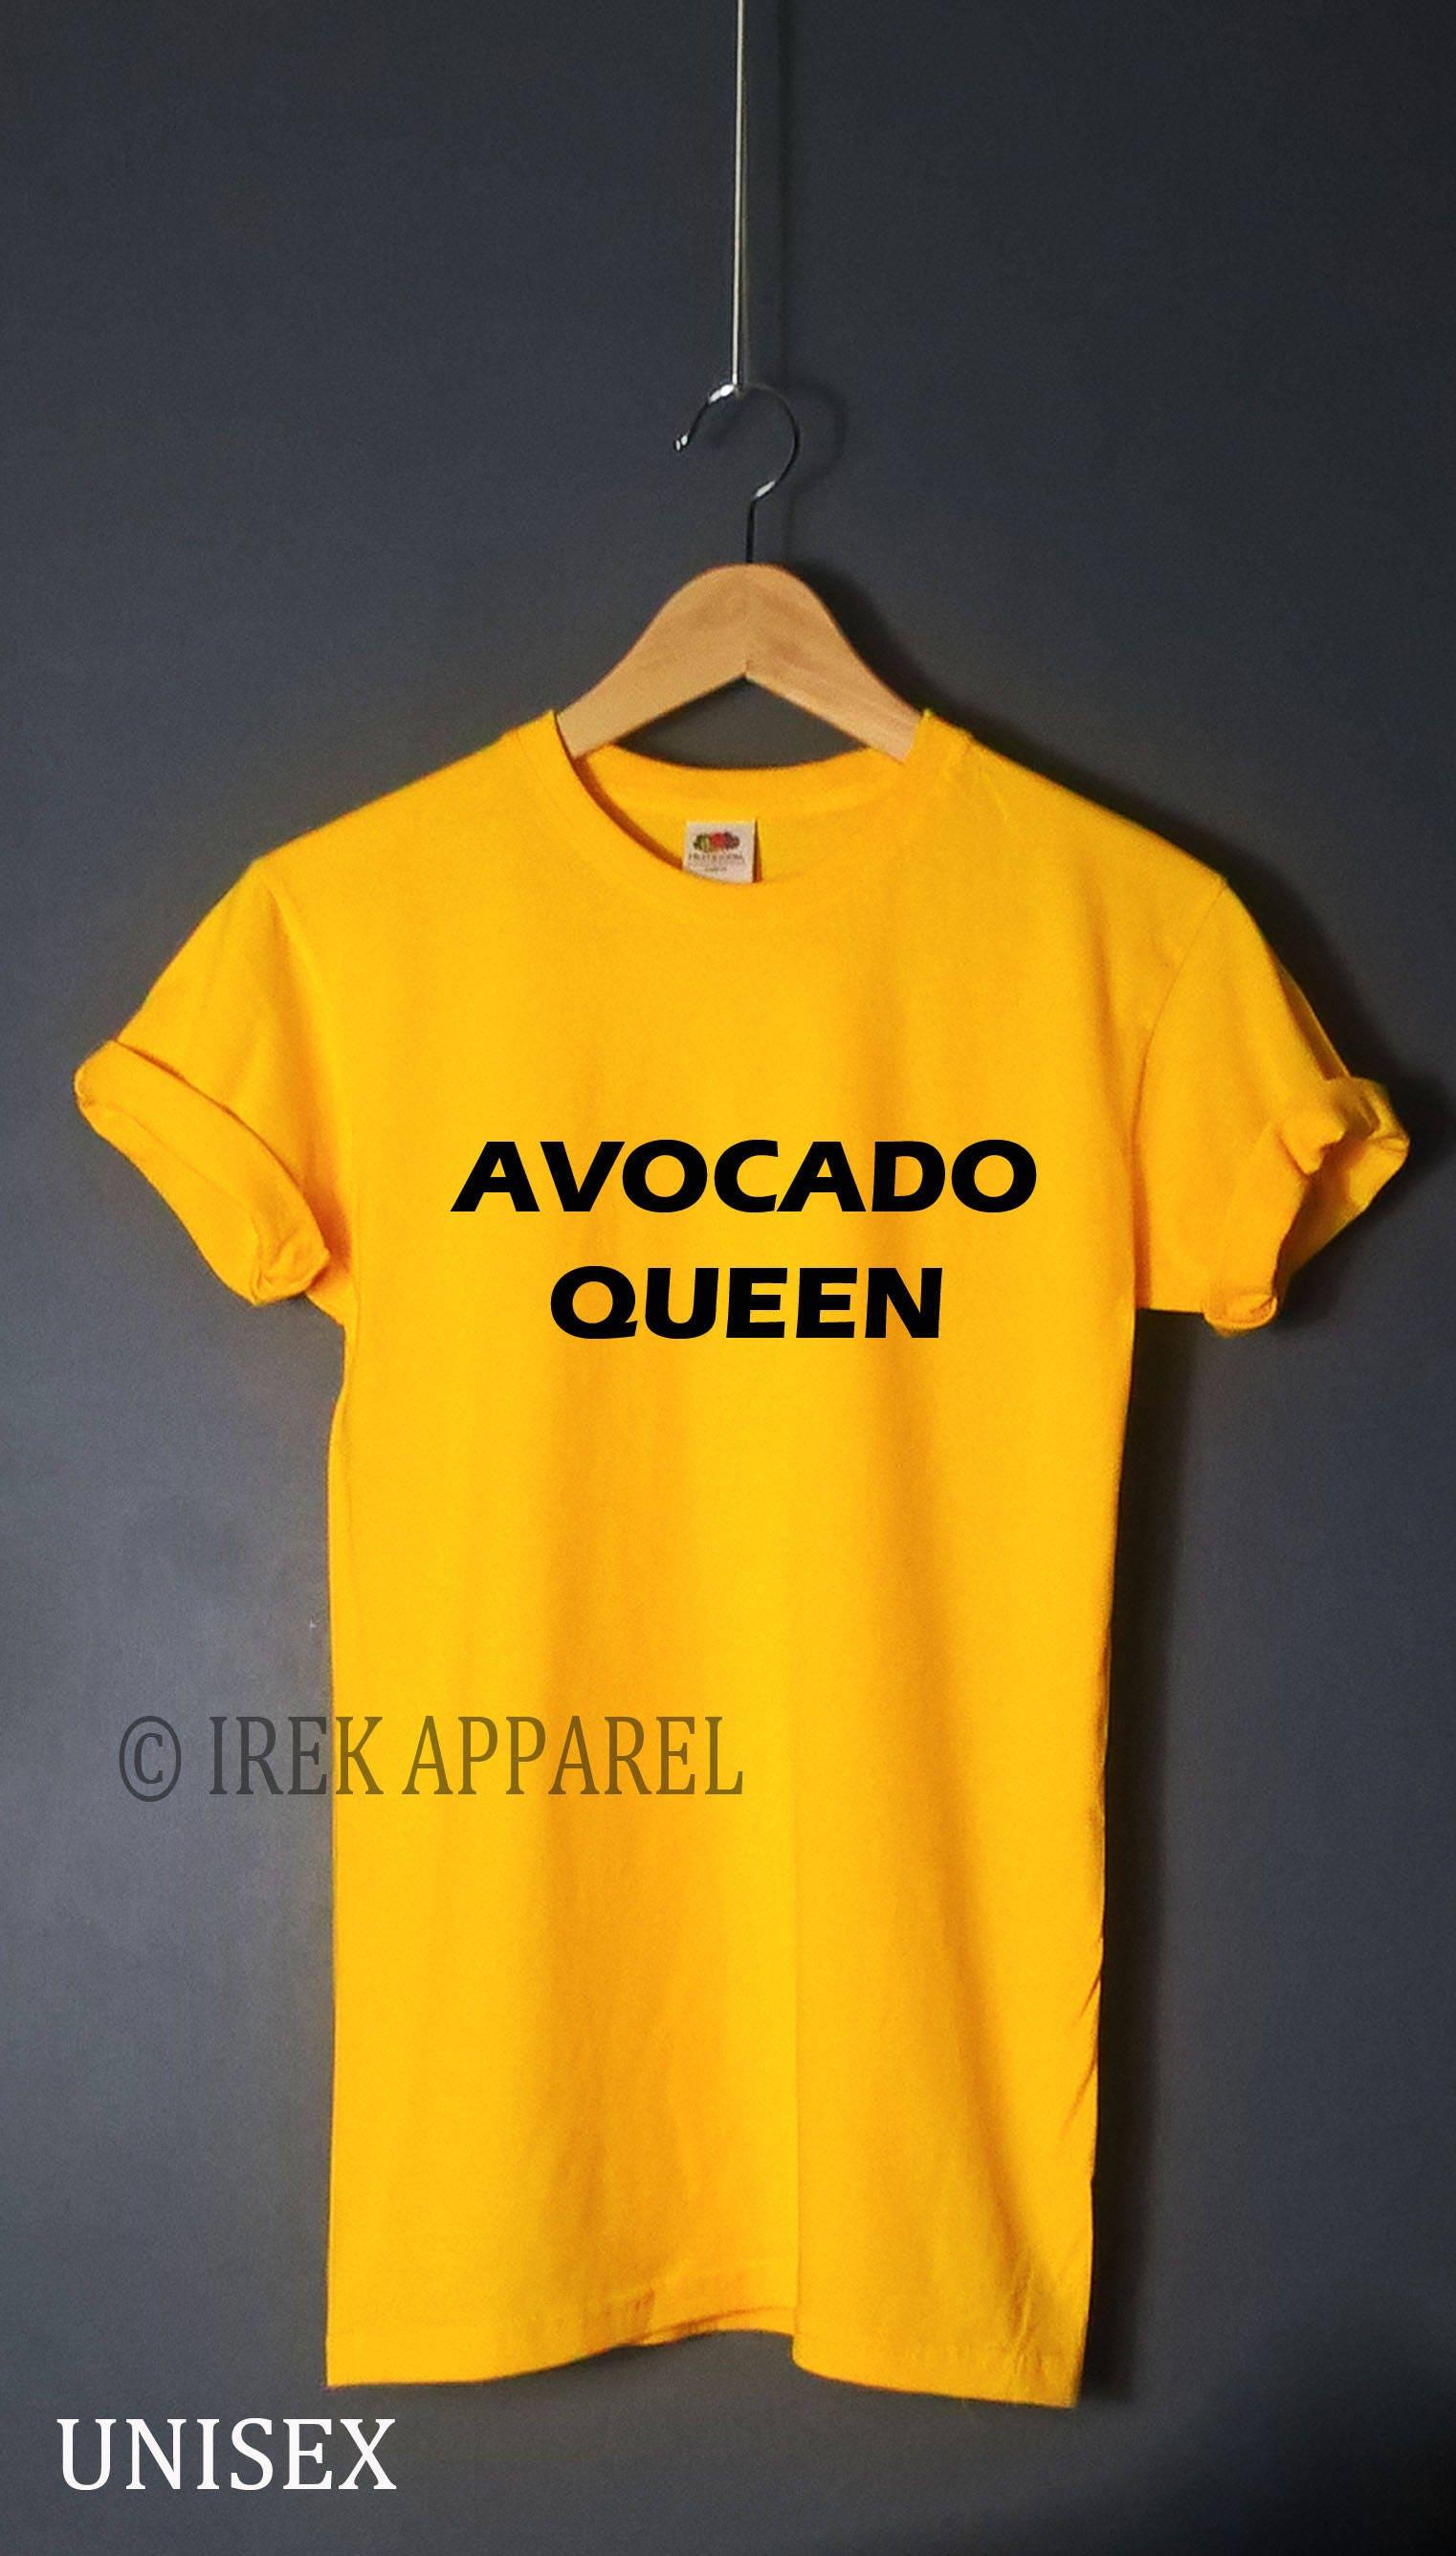 Saggy Teen Tumblr Awesome avocado queen t shirt tumblr tshirt tumblr top tee tumblr